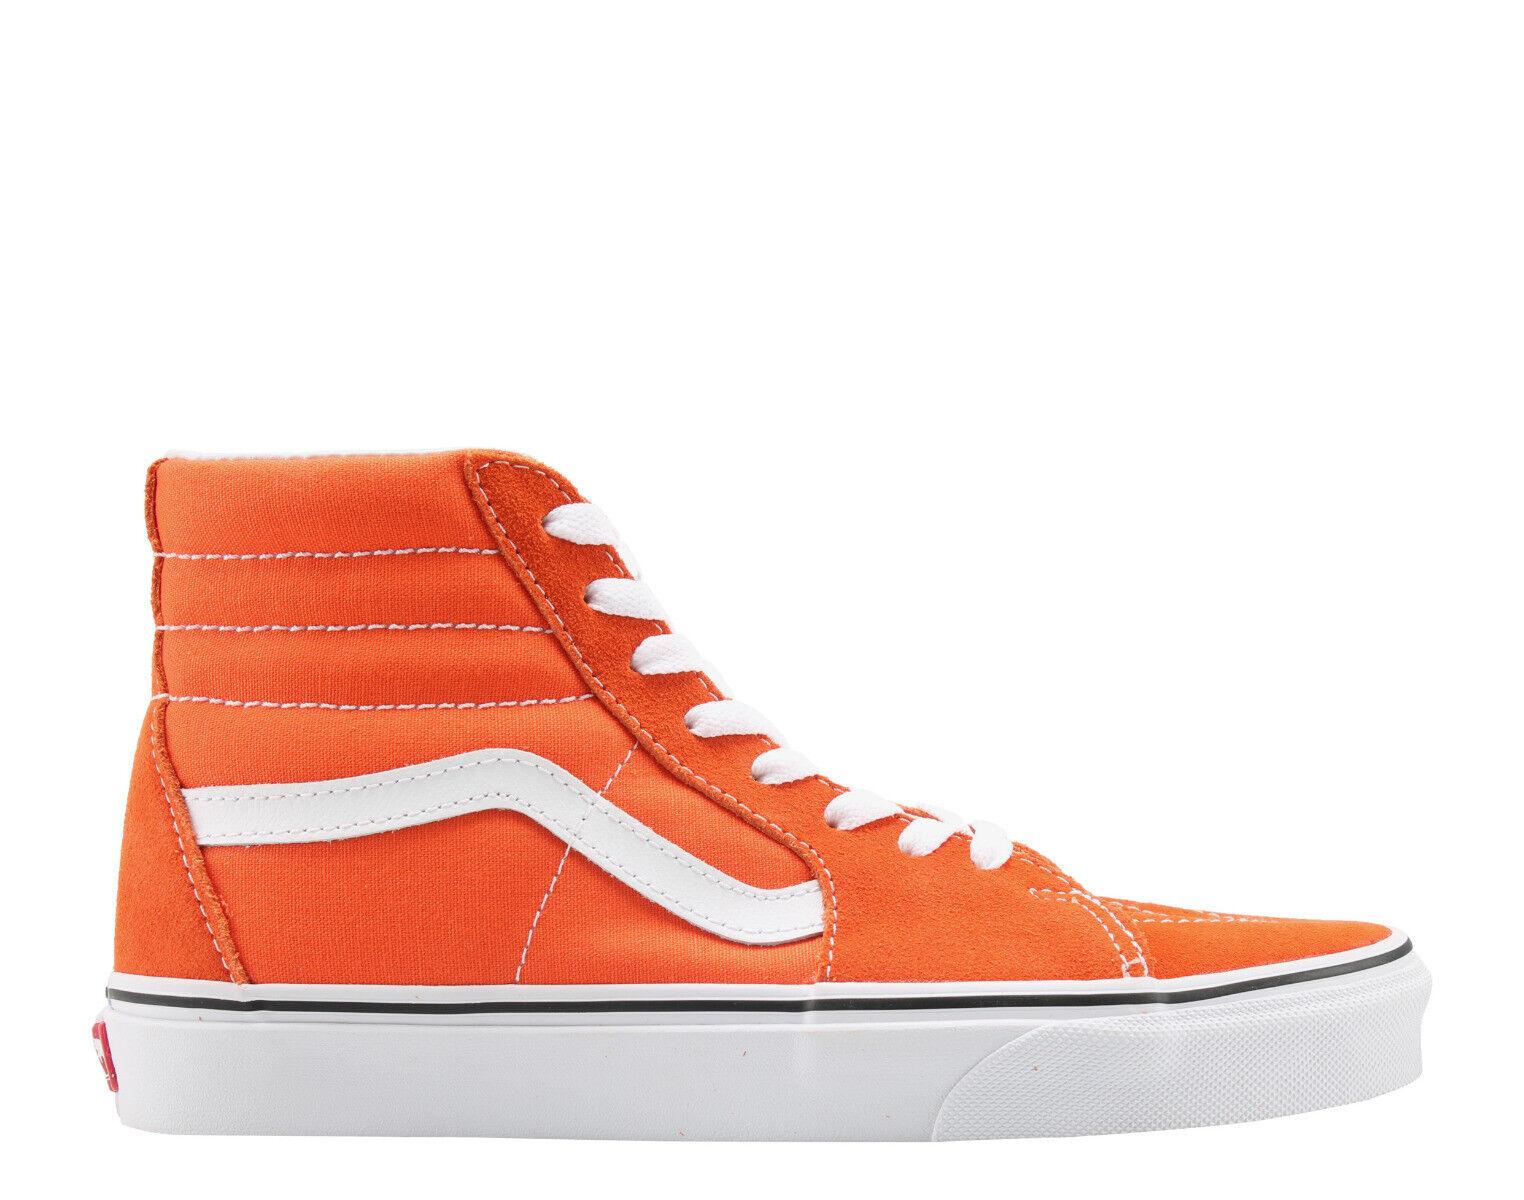 NWOB Men's  Vans Sk8-Hi VN0A38GE2W1  Flame True White shoes Size us 10.5